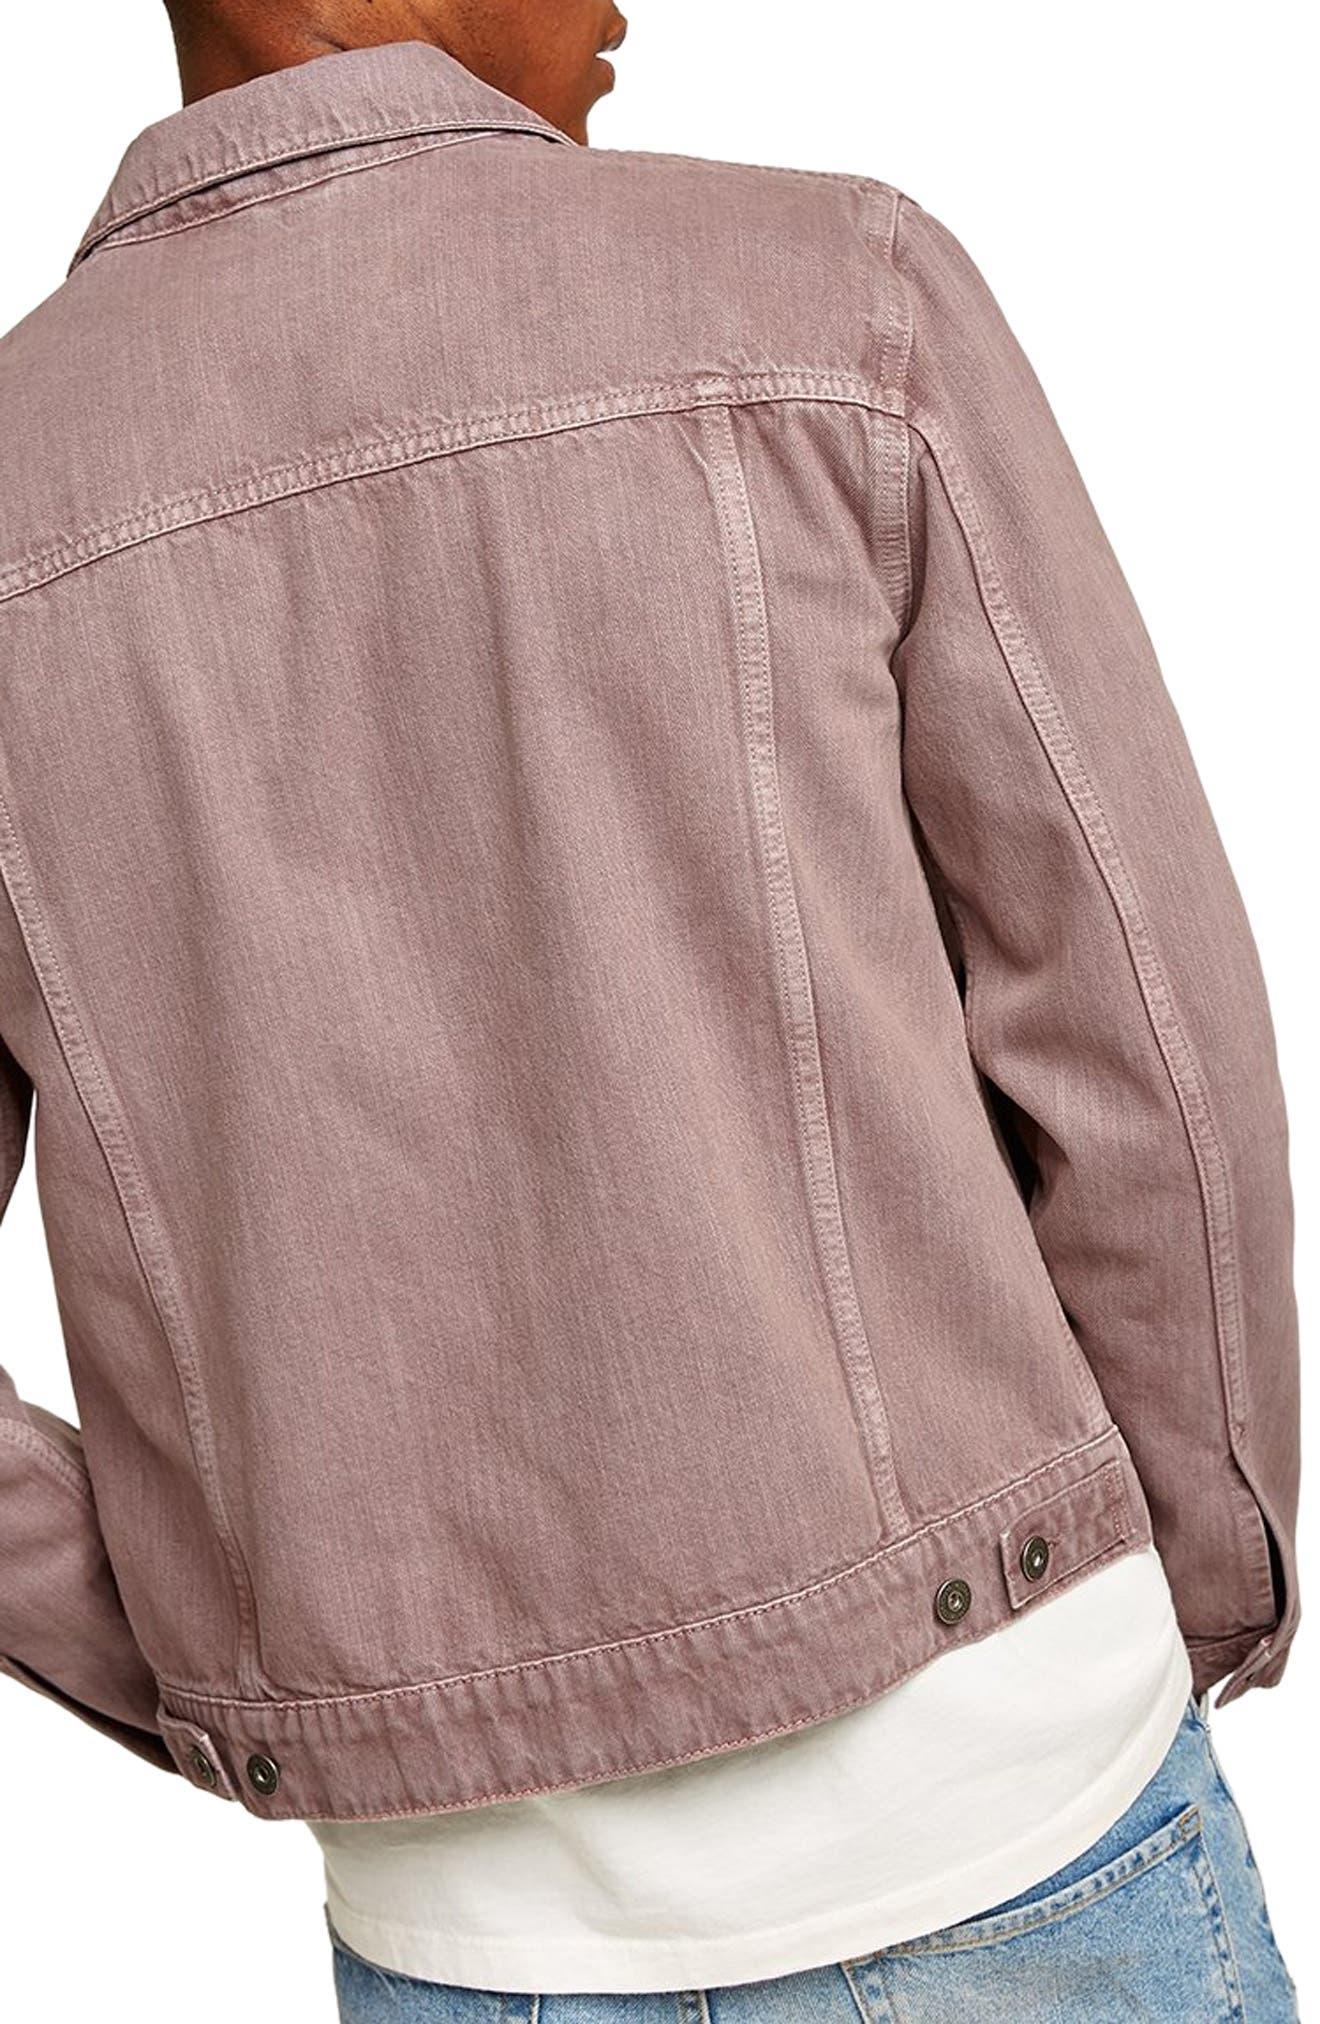 Eamon Denim Jacket,                             Alternate thumbnail 2, color,                             PINK